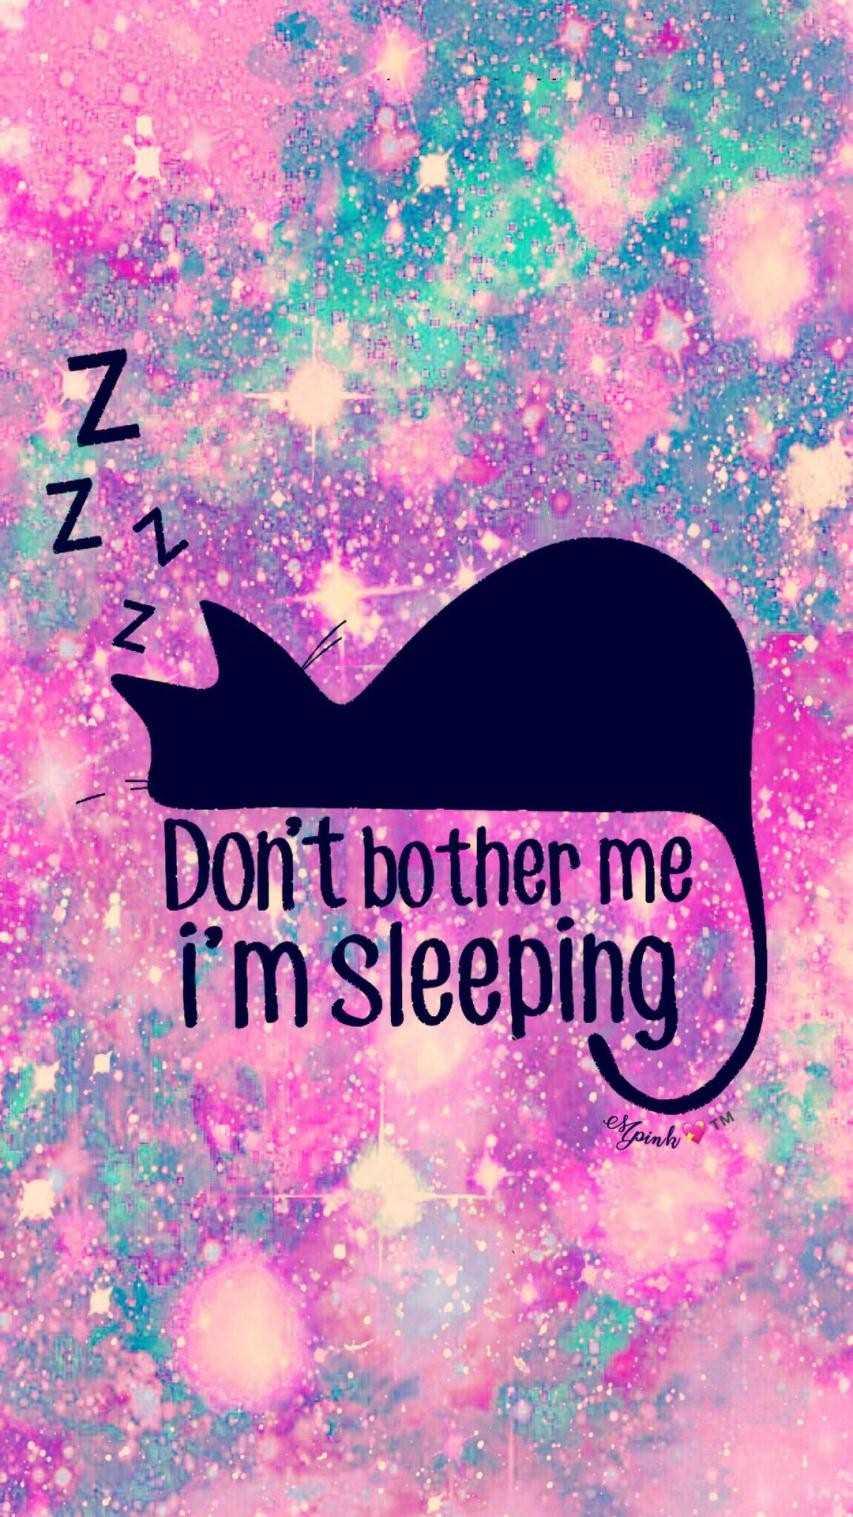 Unicorn Glitter Wallpaper Do Not Disturb Im Sleeping, Hd